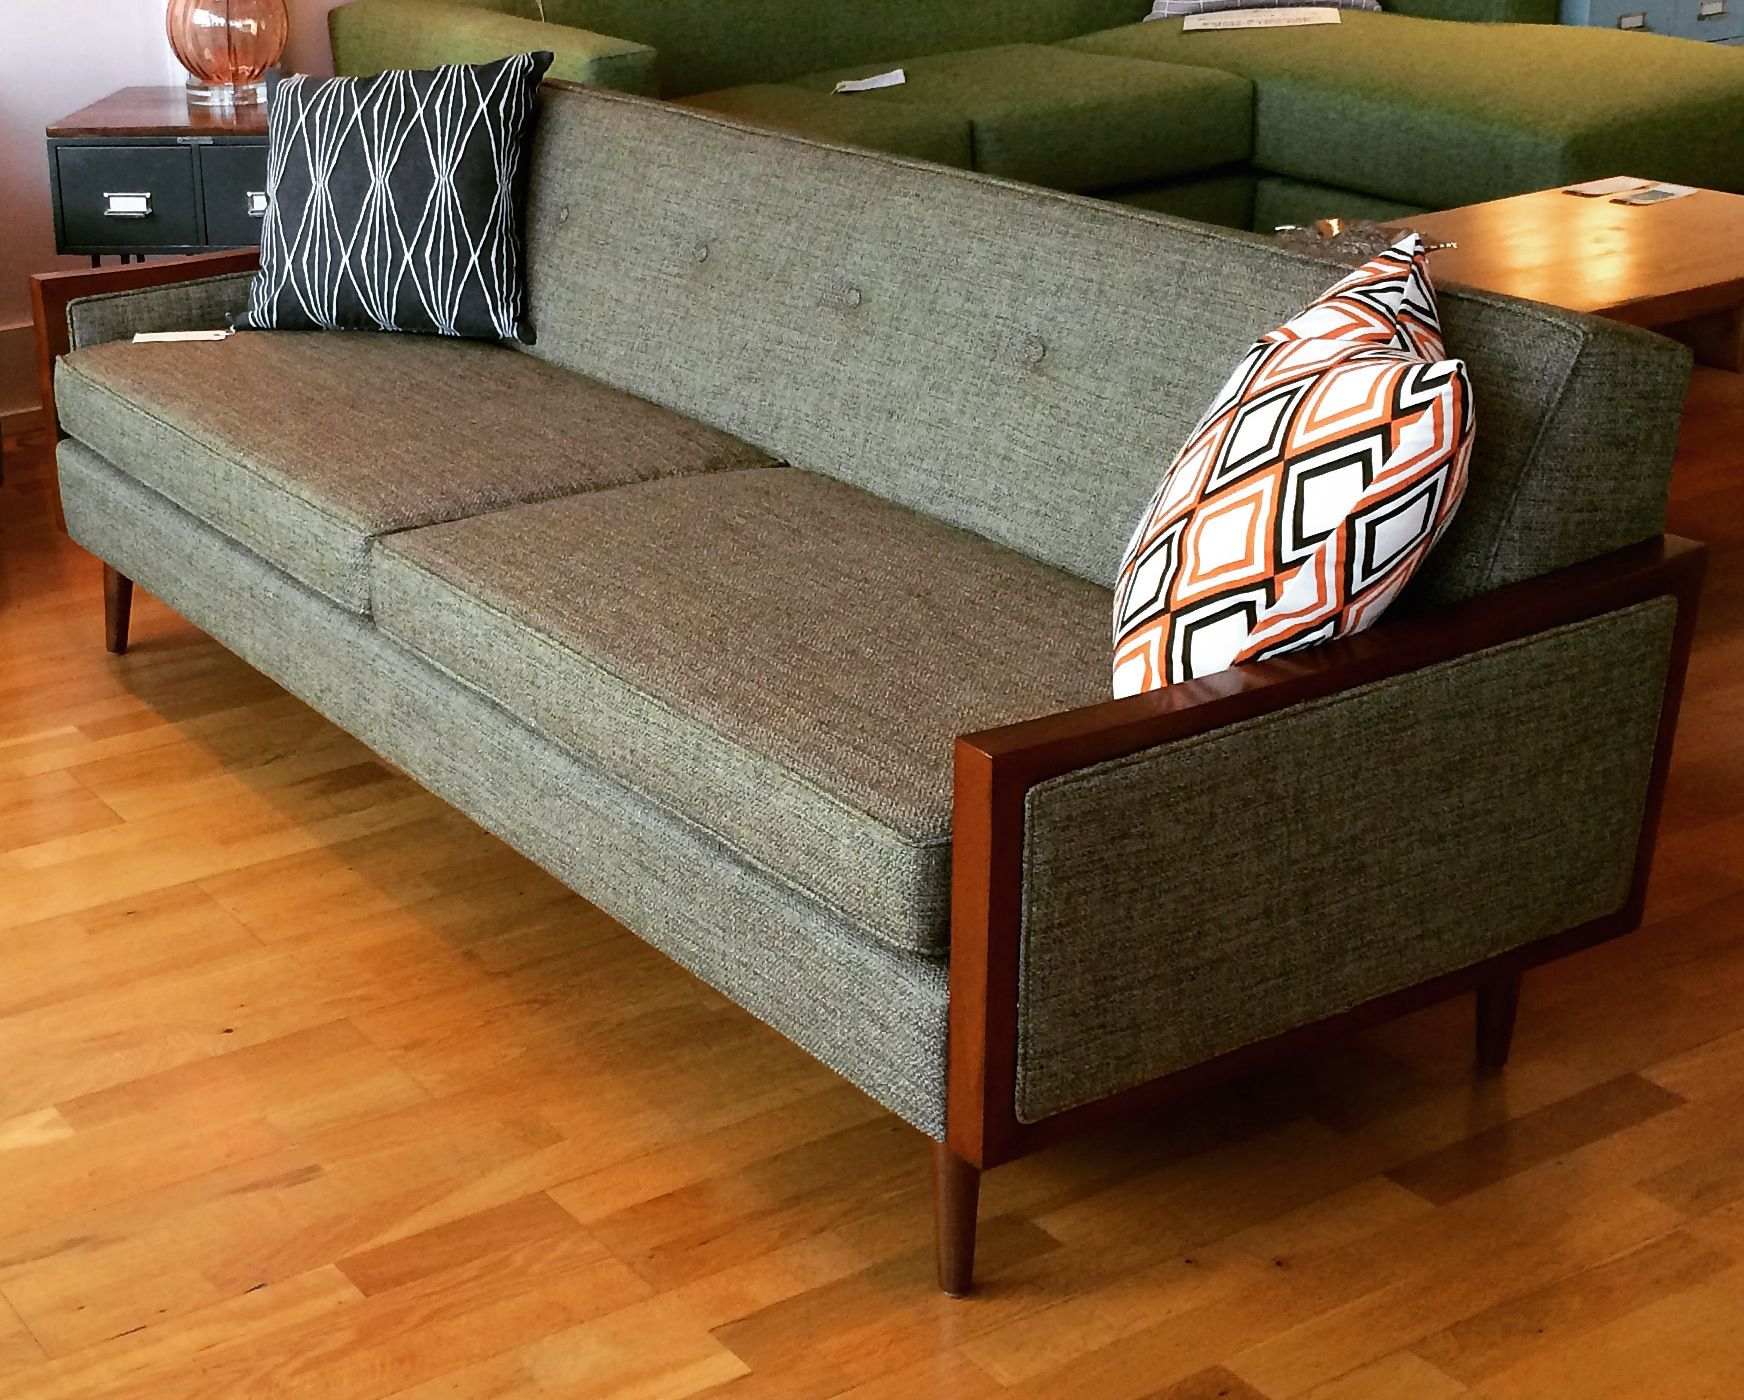 Havana Mid Century Modern Sofa With Wood Arms Design